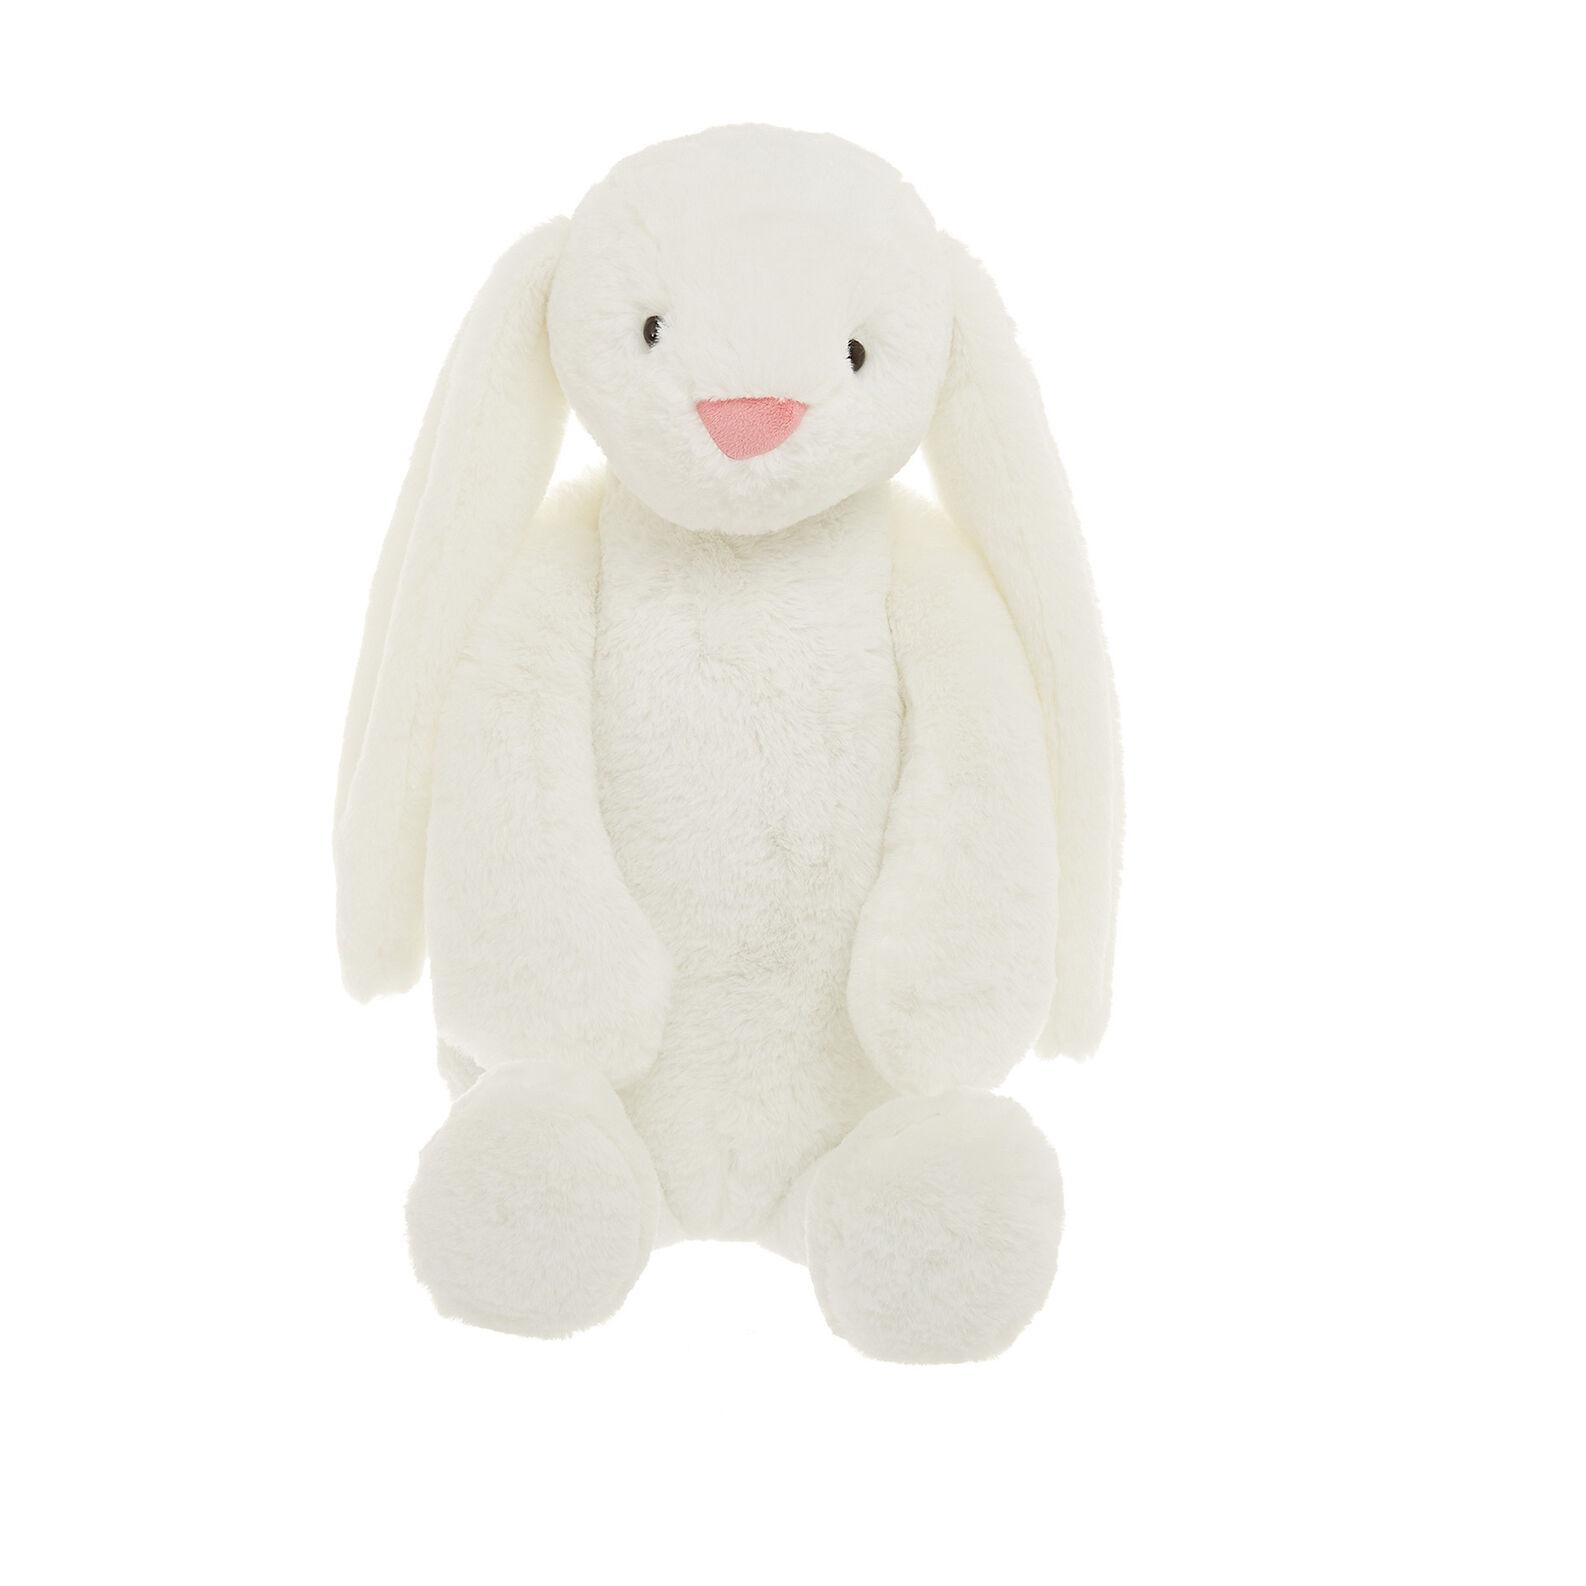 Rabbit-shaped soft toy